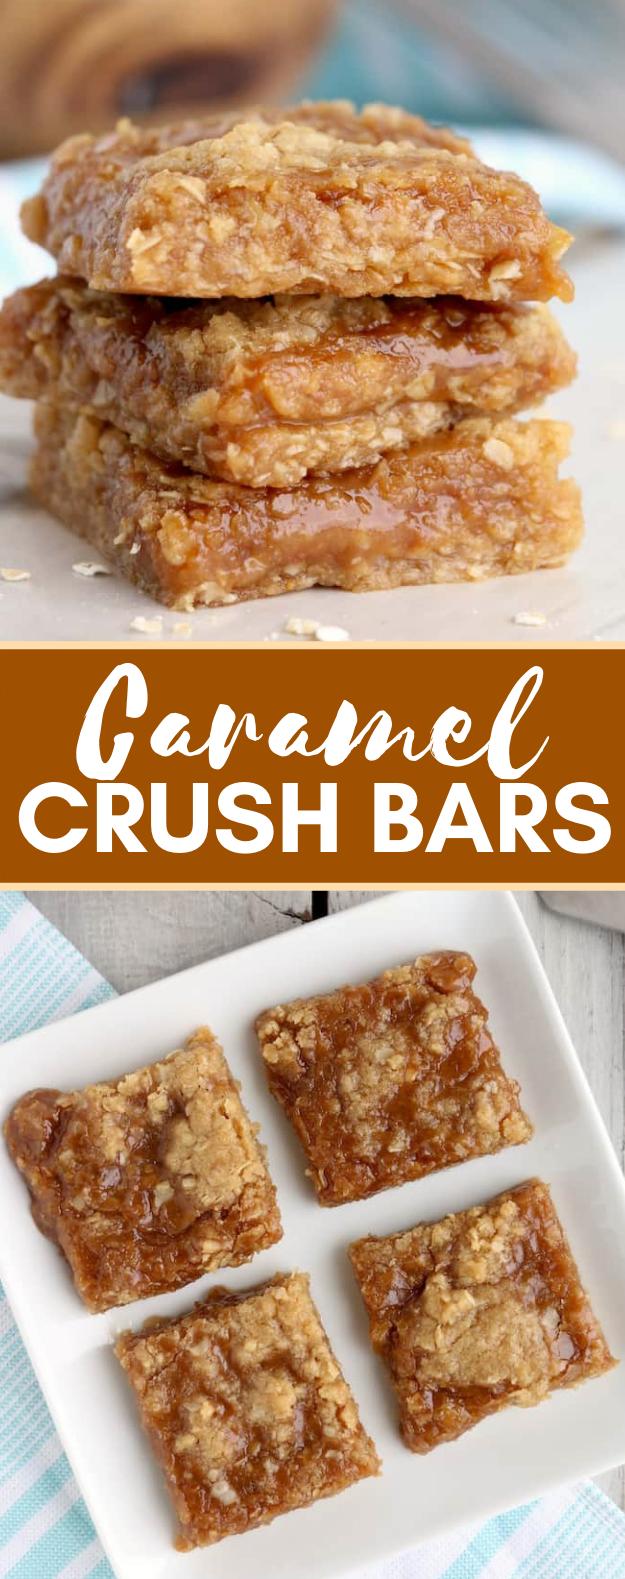 Caramel Crush Bars #desserts #sweets #caramel #bars #easyrecipe